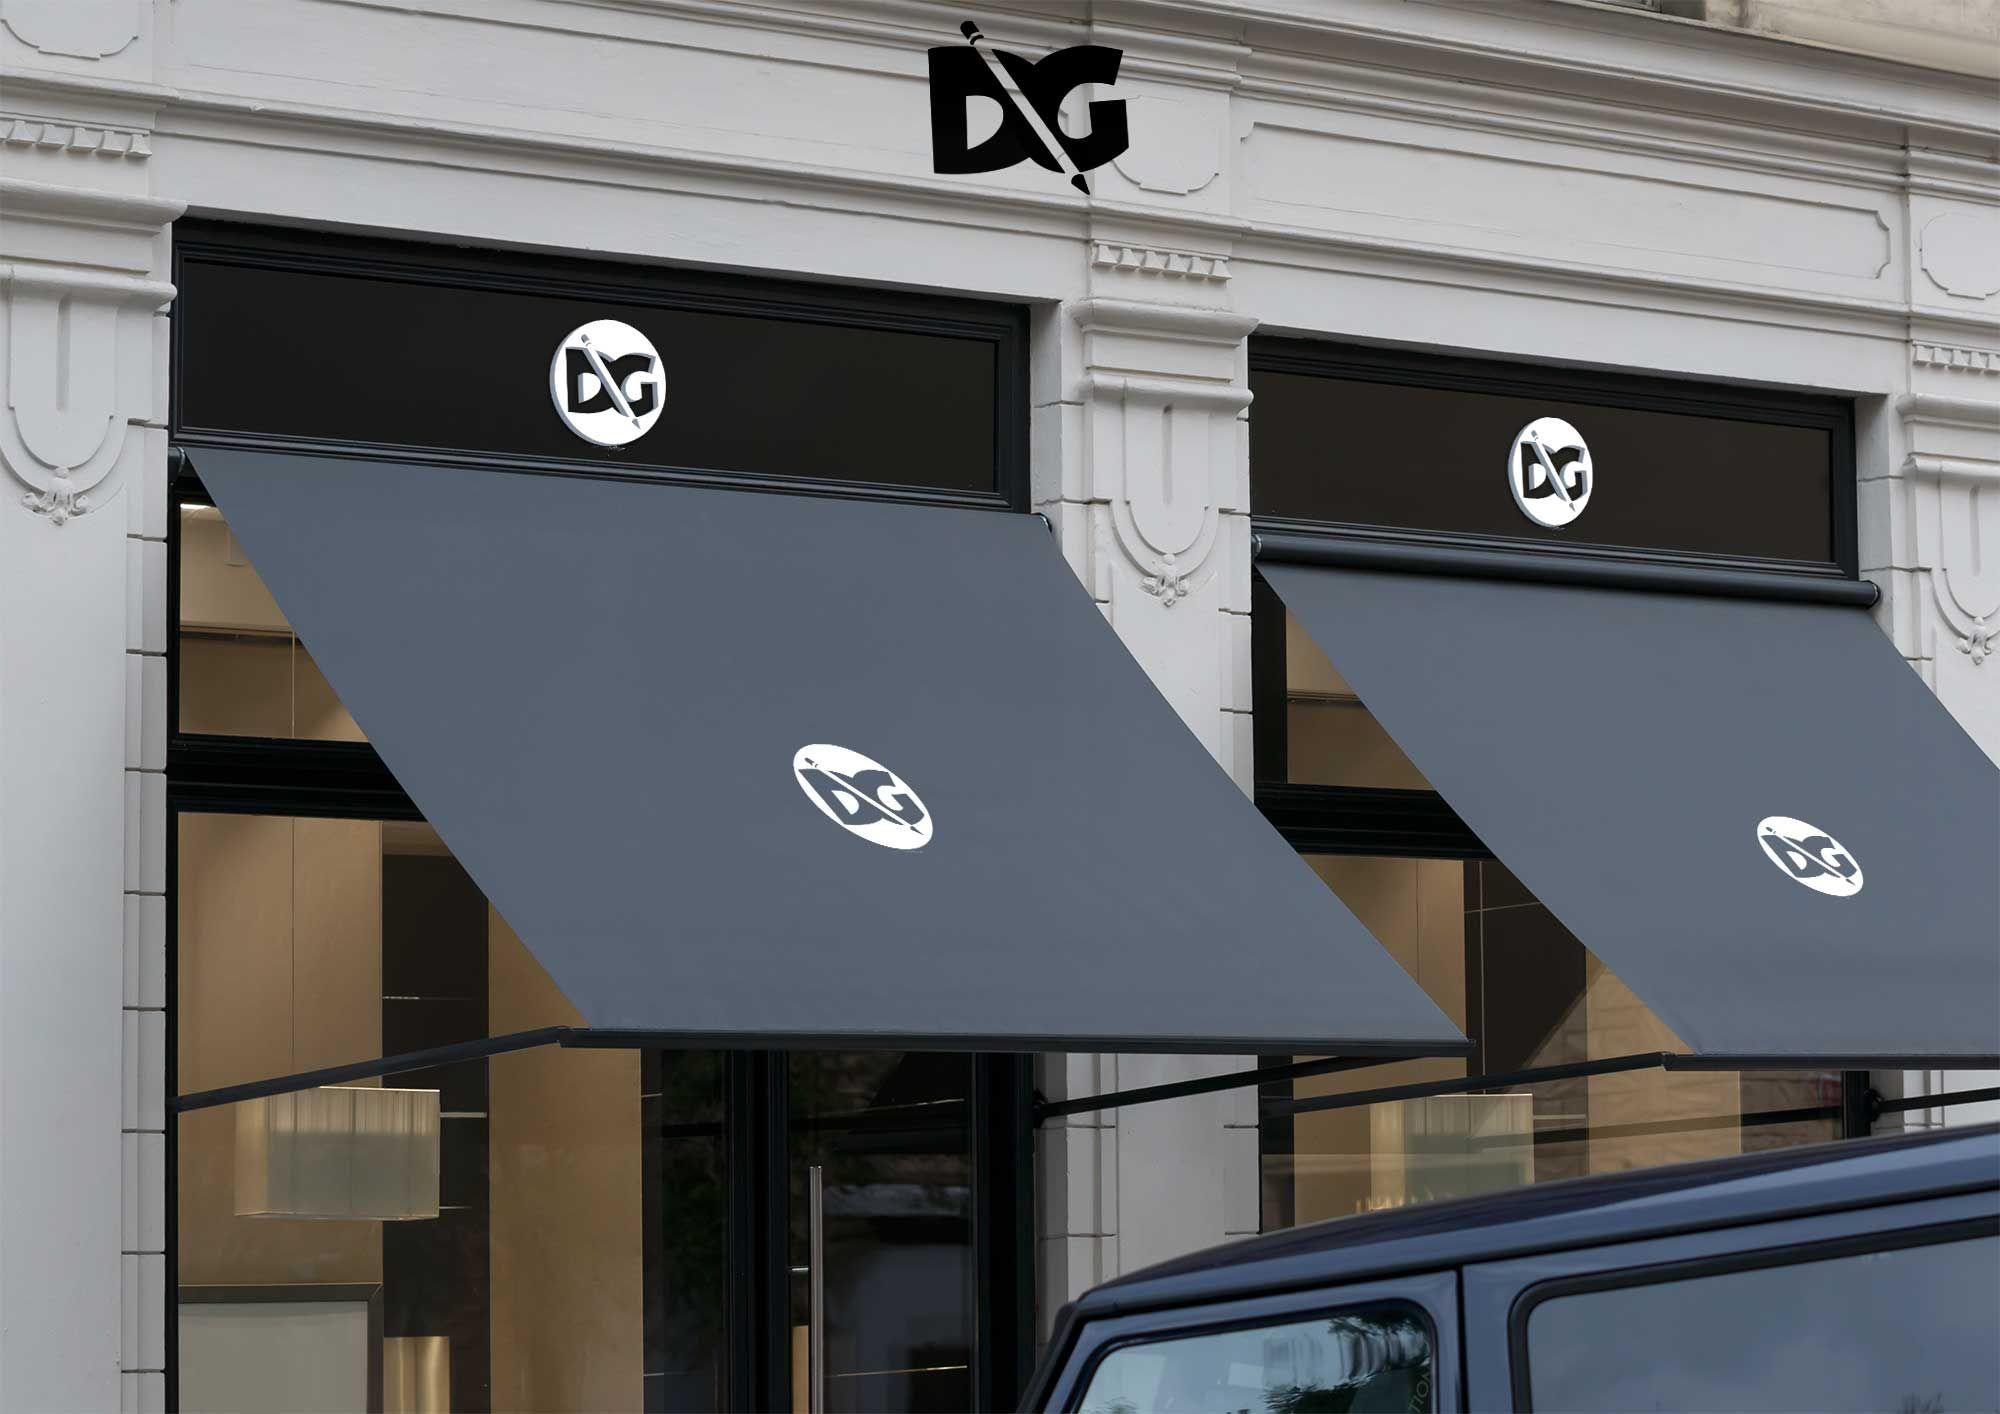 Shop Wall Logo mockup in 2020 Mockup free download, Logo